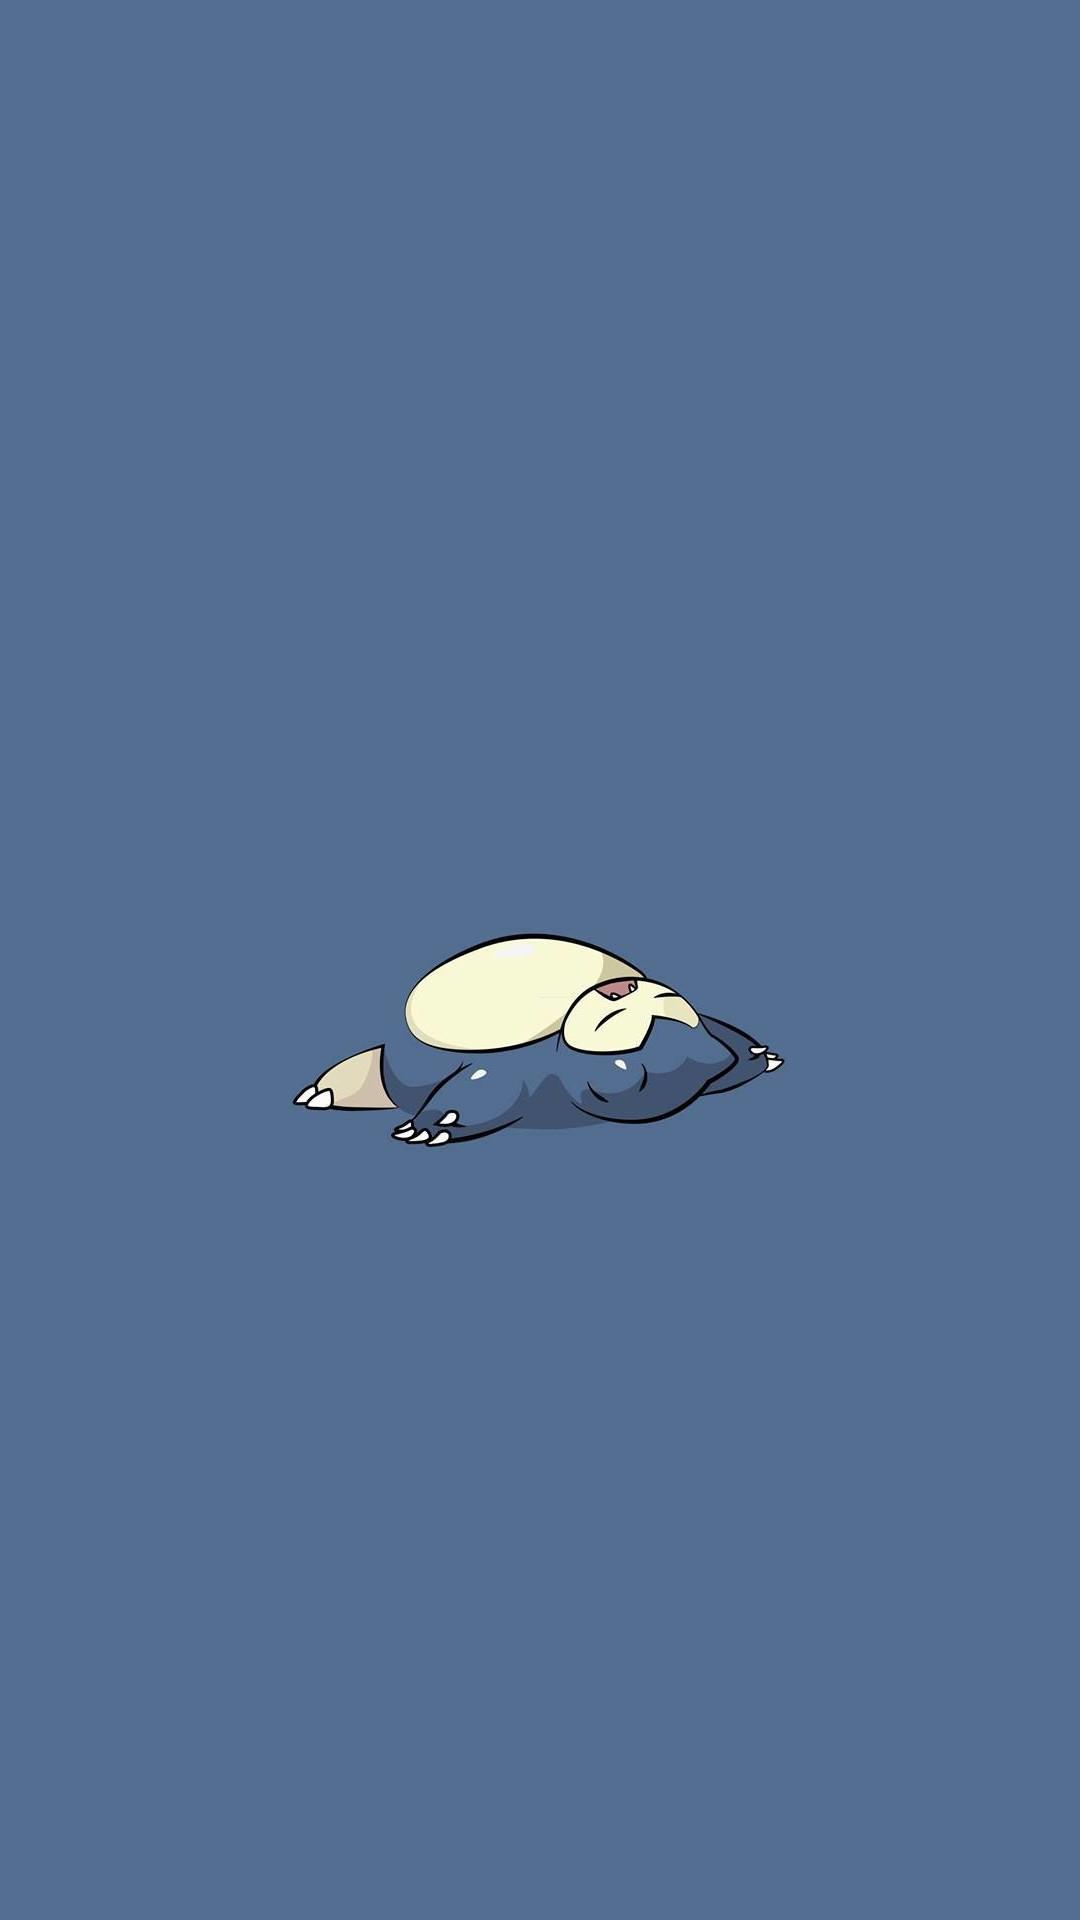 Snorlax Pokemon iPhone 6+ HD Wallpaper …